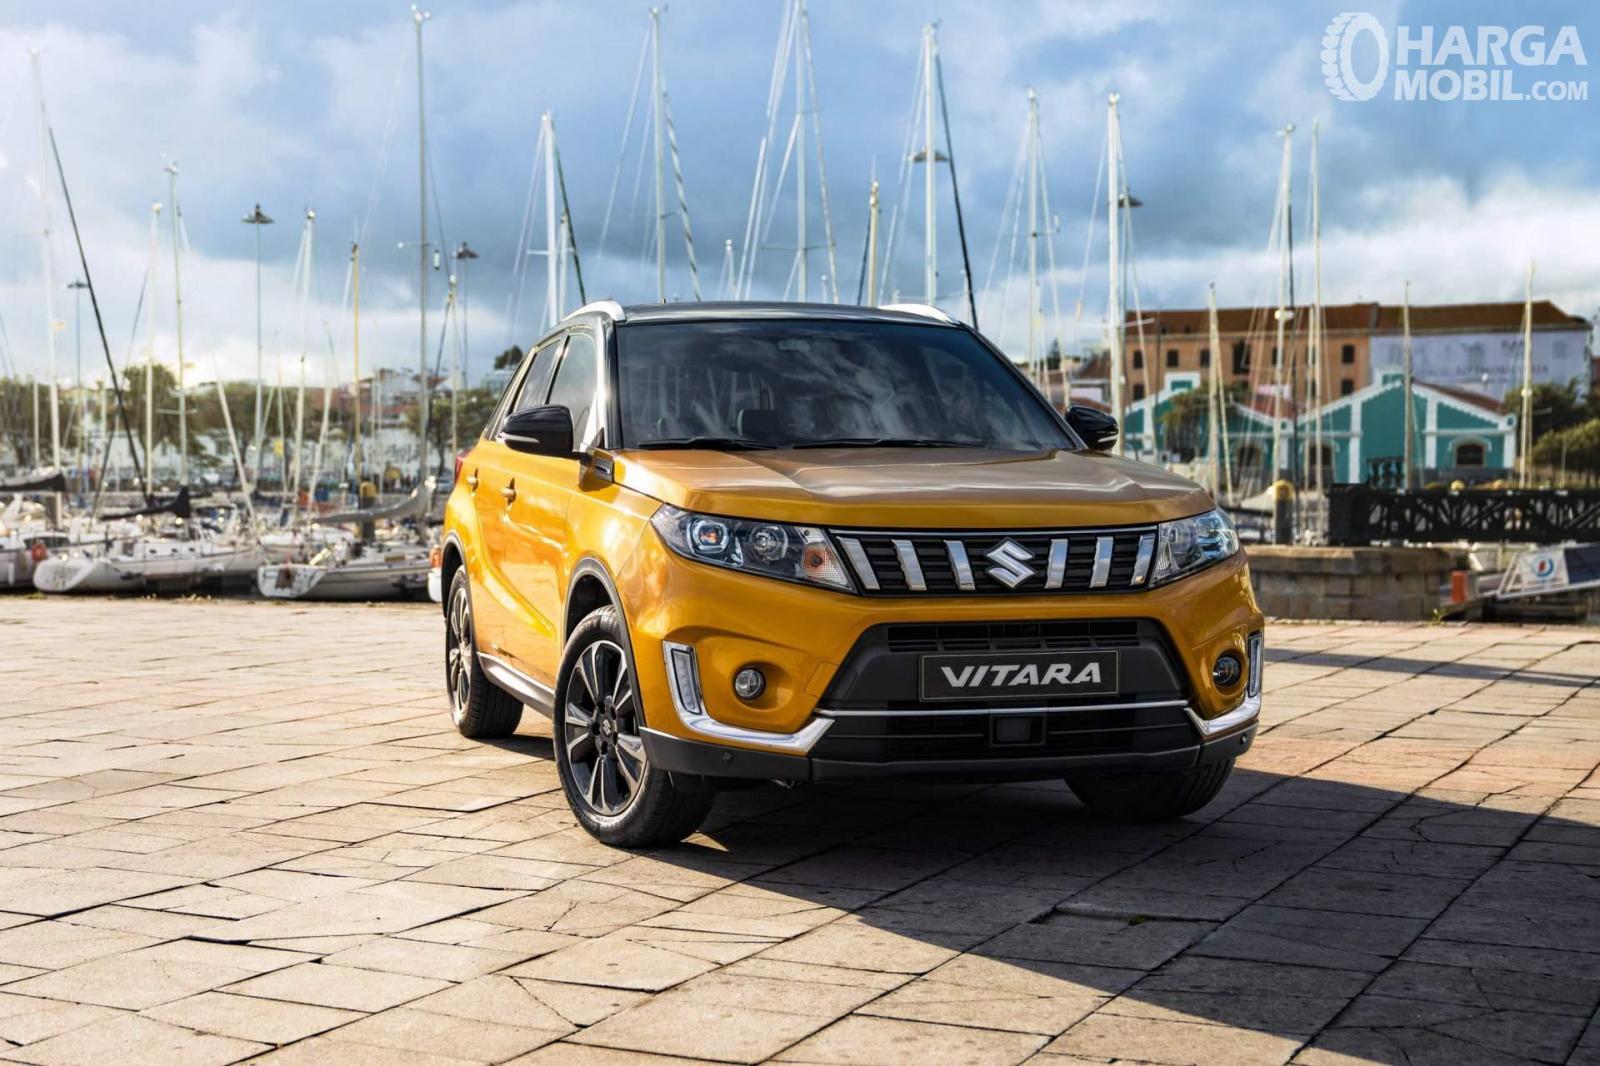 Desain Suzuki Vitara 2019 terlihat maskulin namun agresif